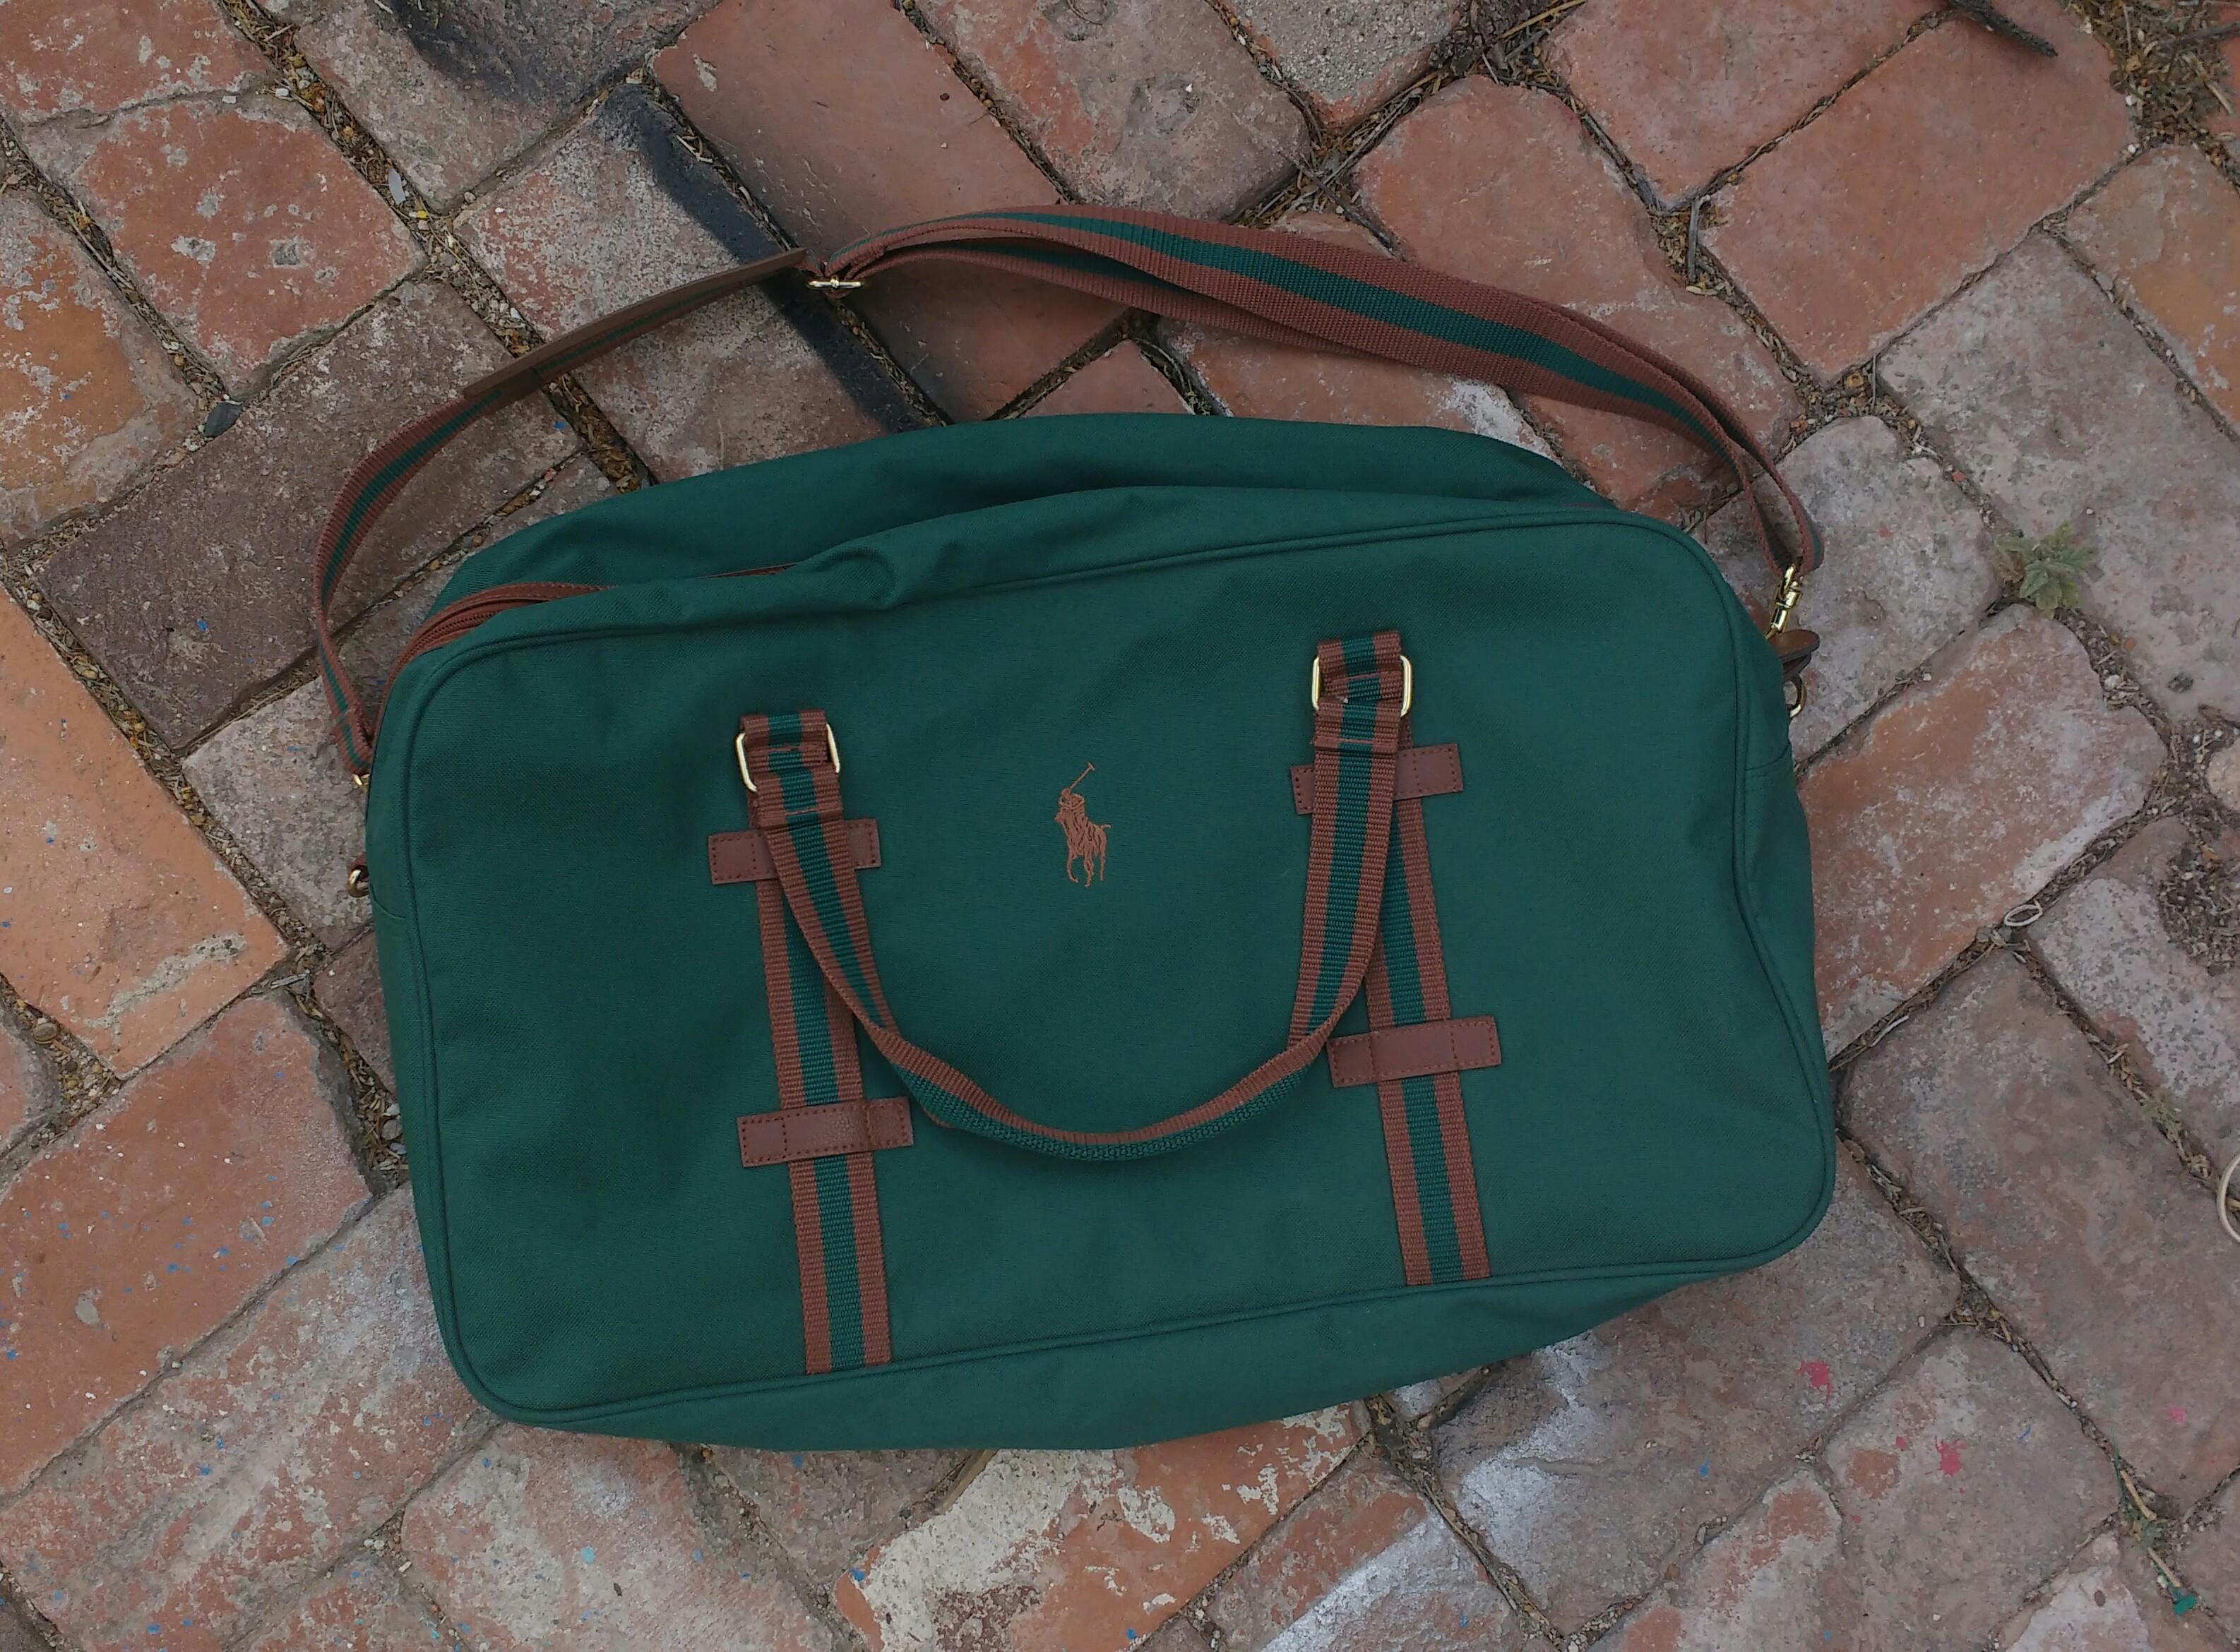 76ad4fec518 Vintage Polo Ralph Lauren Green Duffle Bag on Storenvy